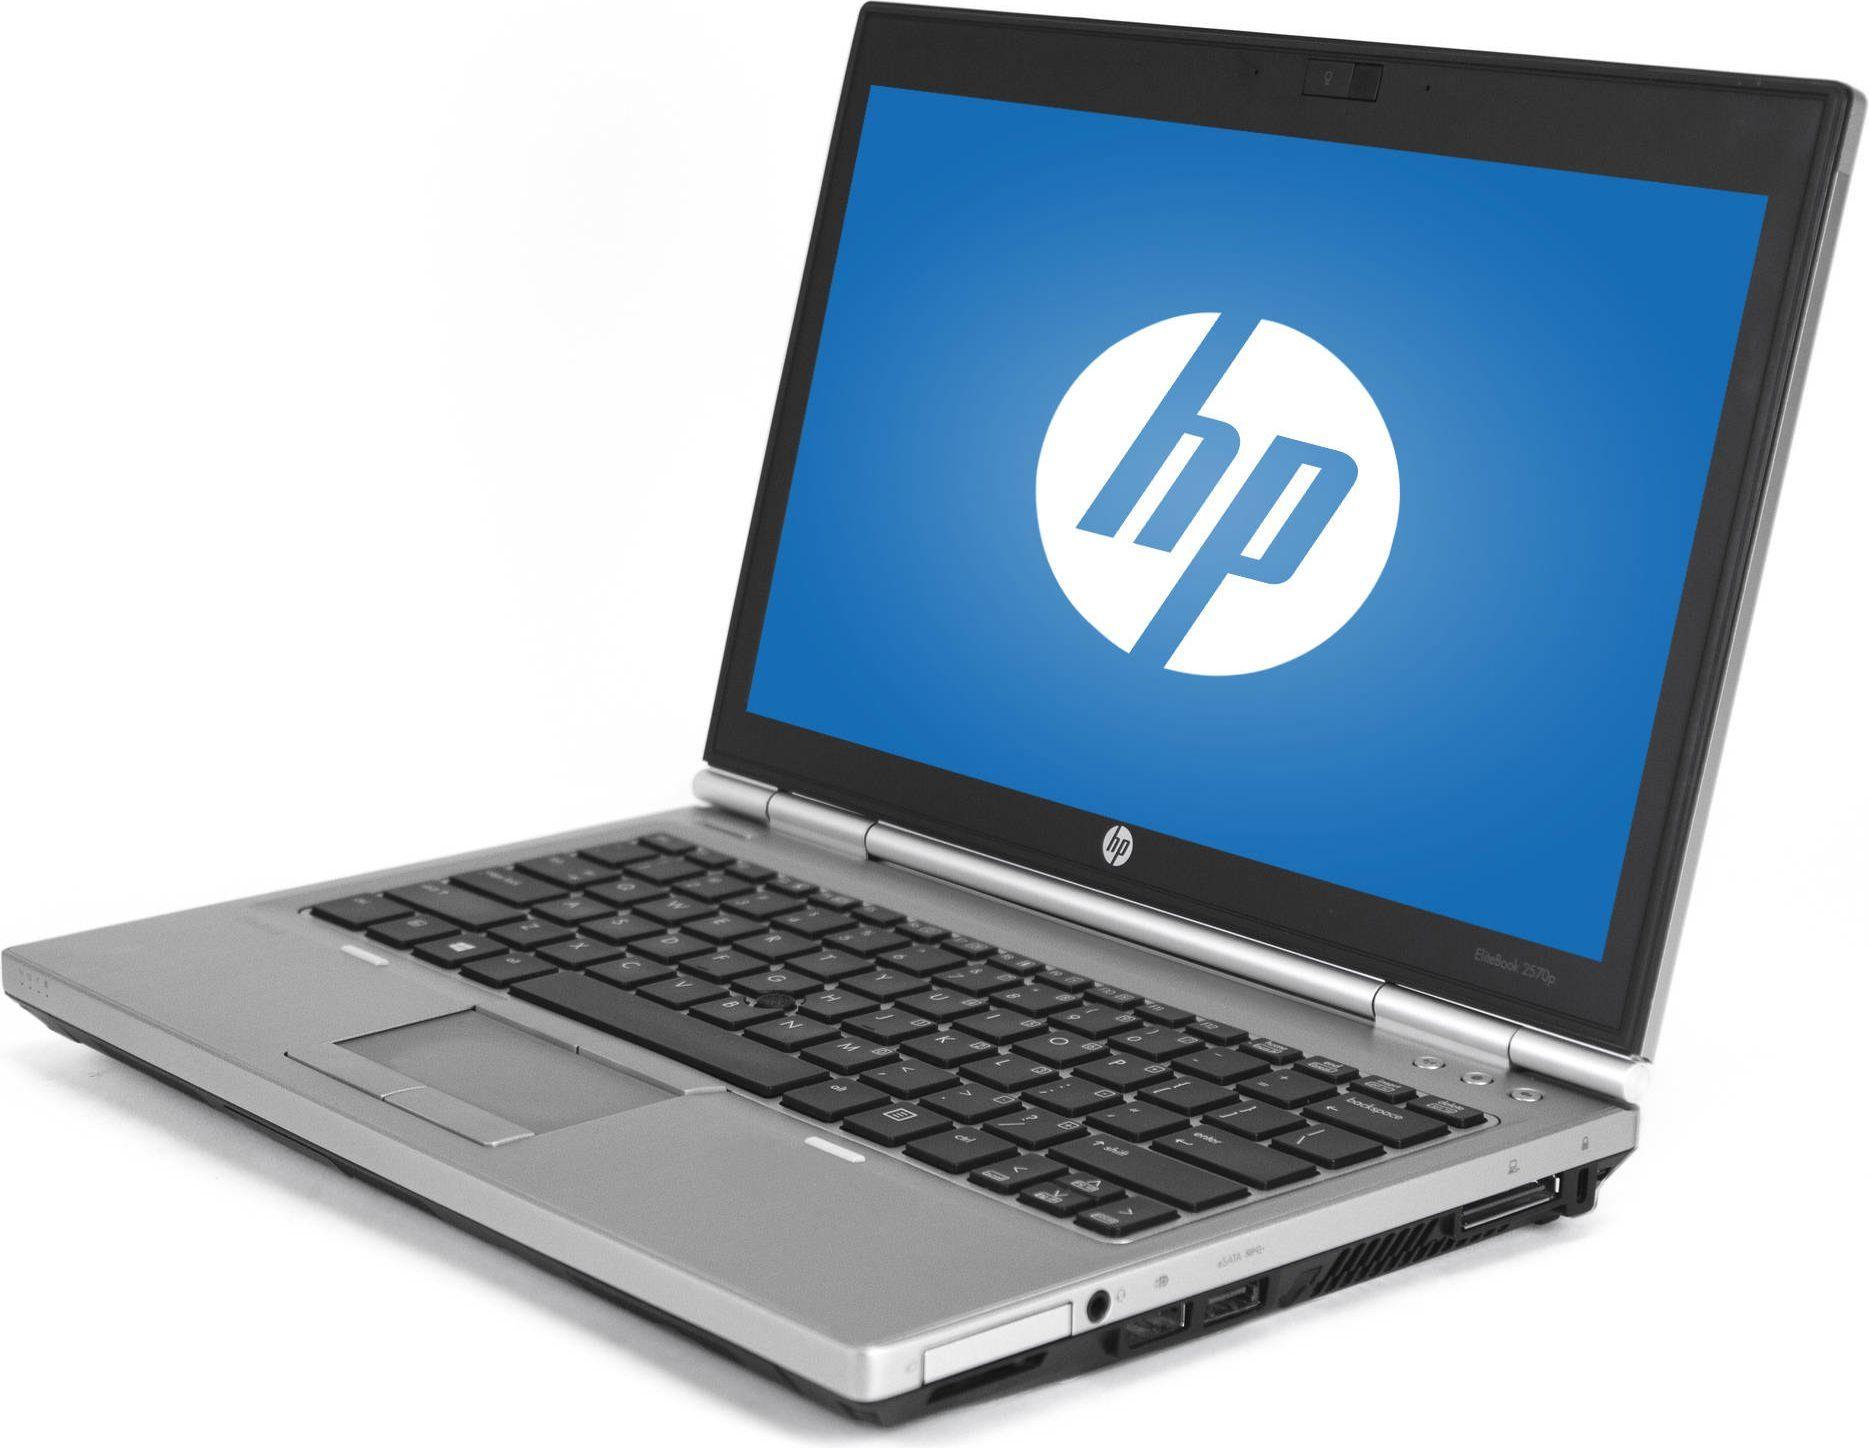 Laptop HP 2570p 12.5 i5-3320m 8GB 120GB SSD Win7 Pro (GW)@Morele